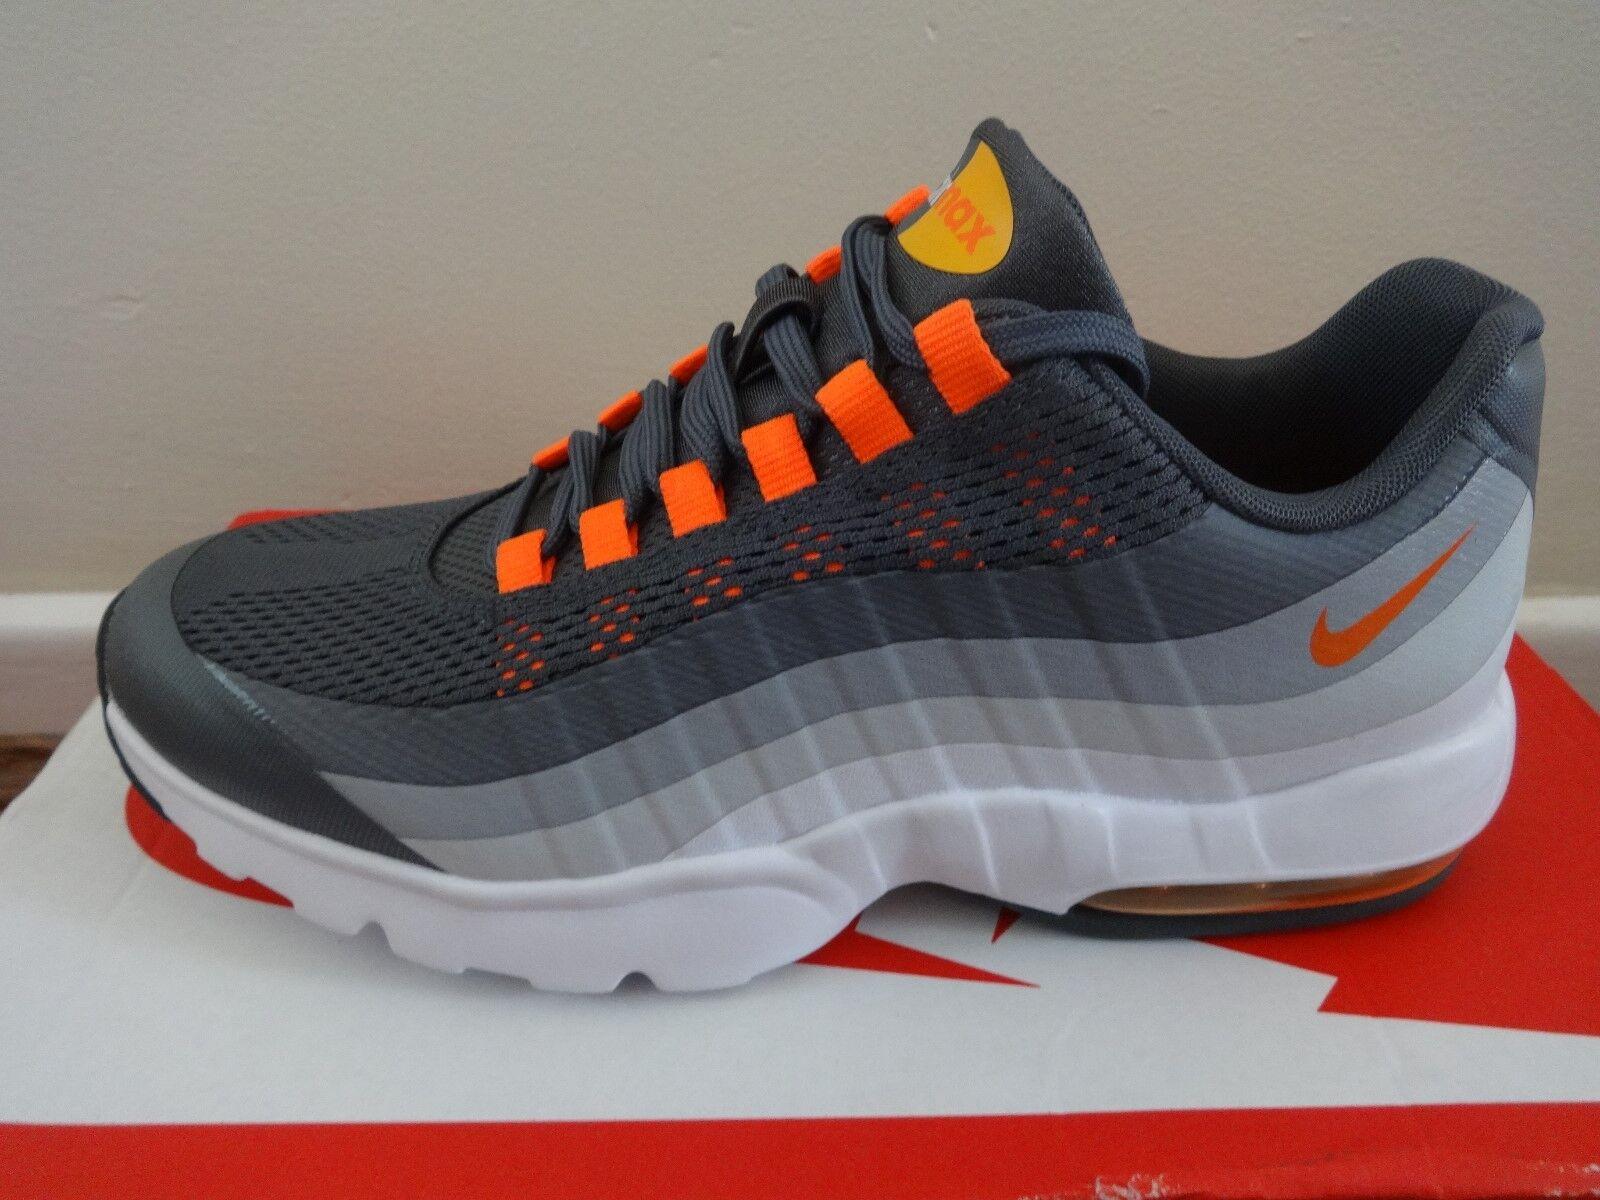 Nike AIR MAX 95 Ultra Scarpe Da Ginnastica 749212 001 EU 38 US 7 Nuovo + Scatola